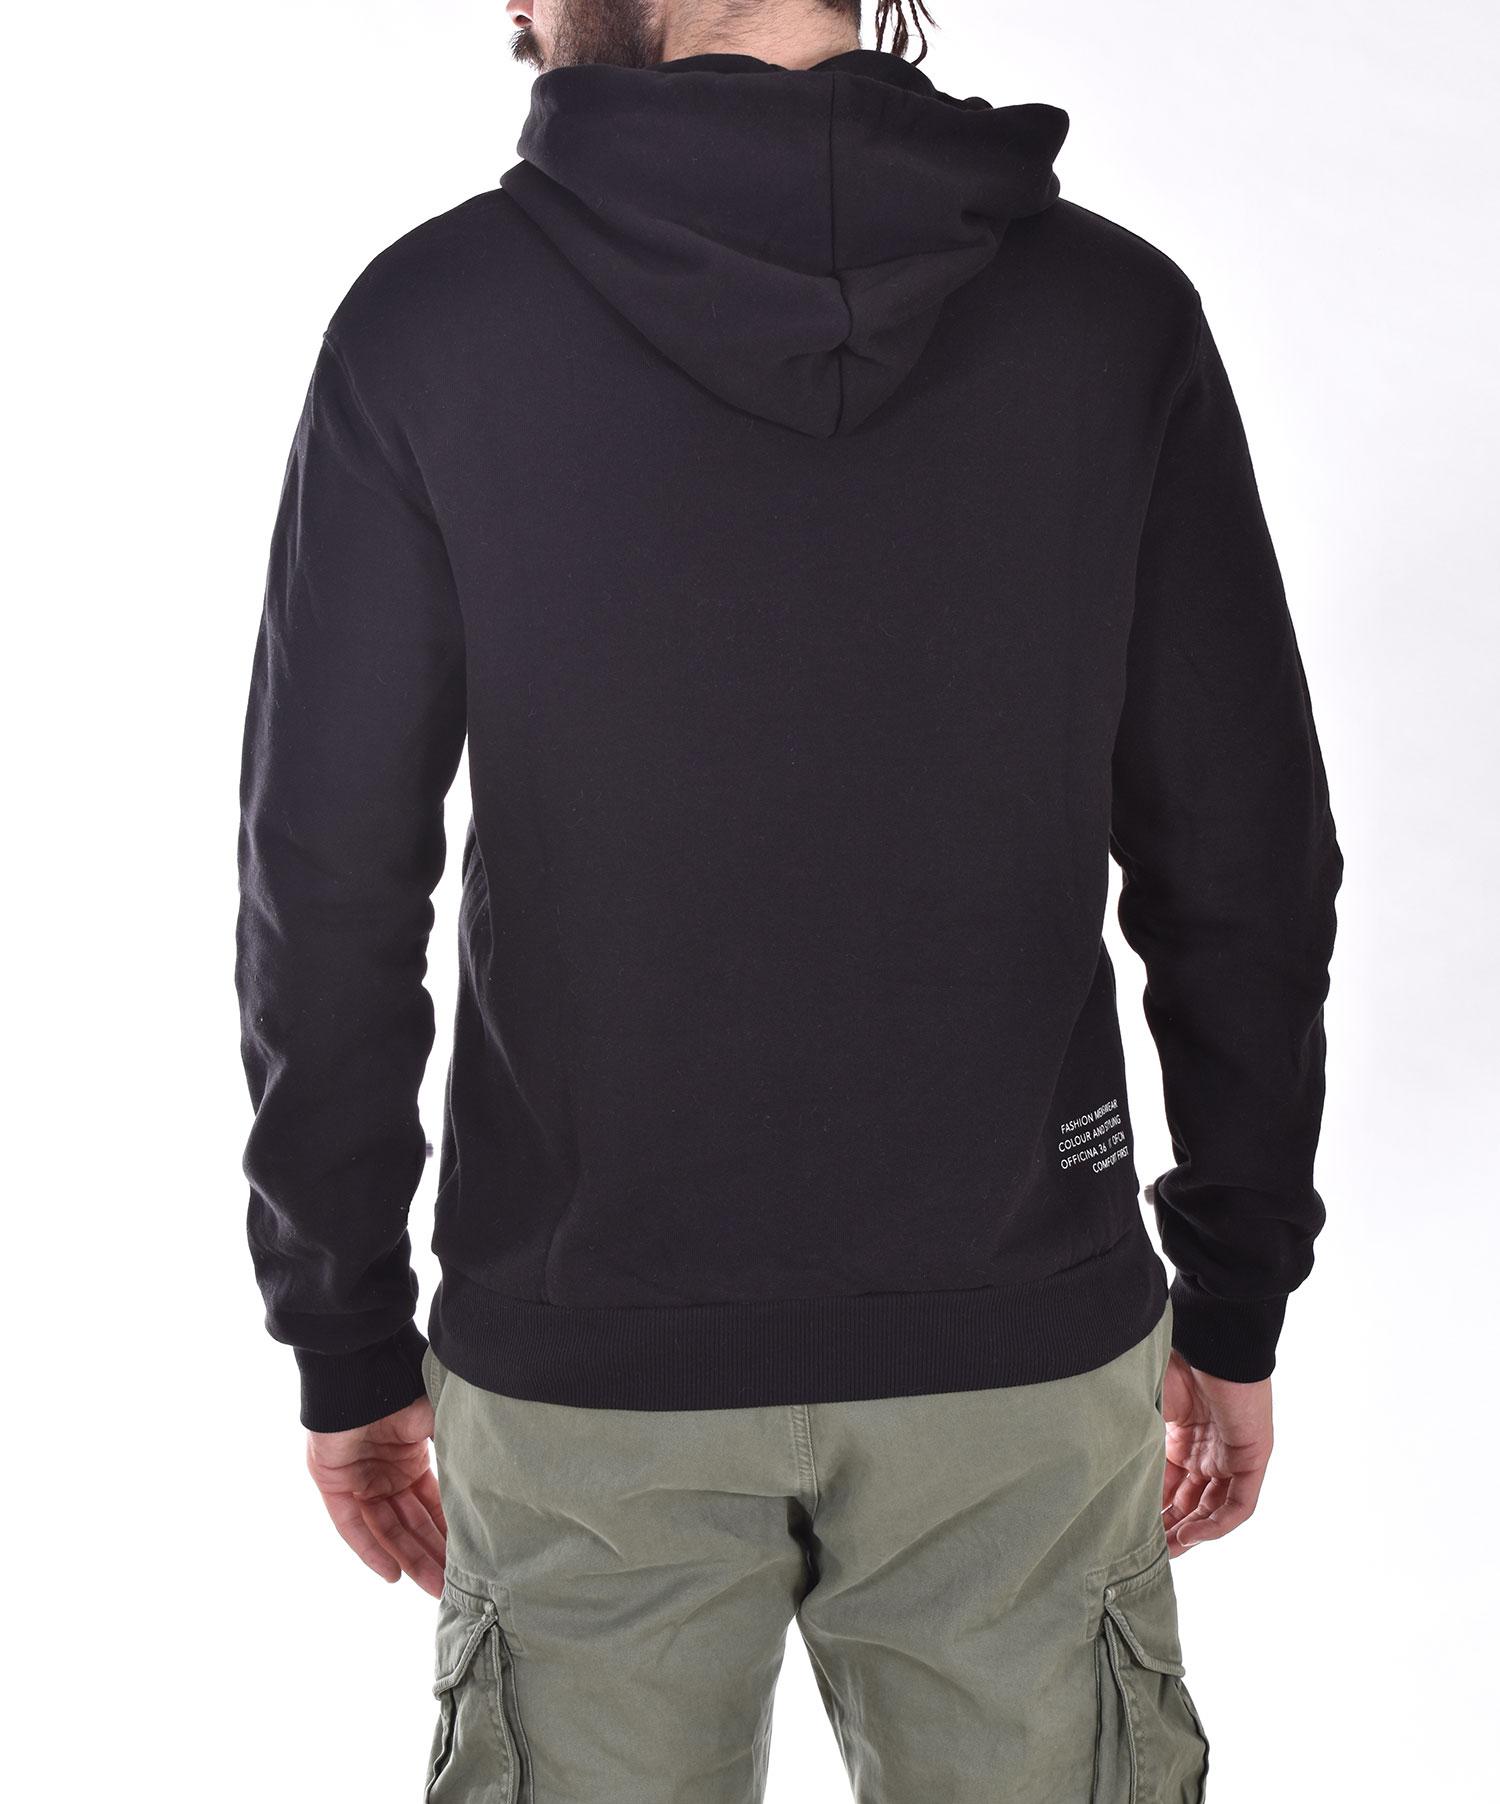 Officina 36 double lace sweatshirt OFFICINA 36 | CUAM8501